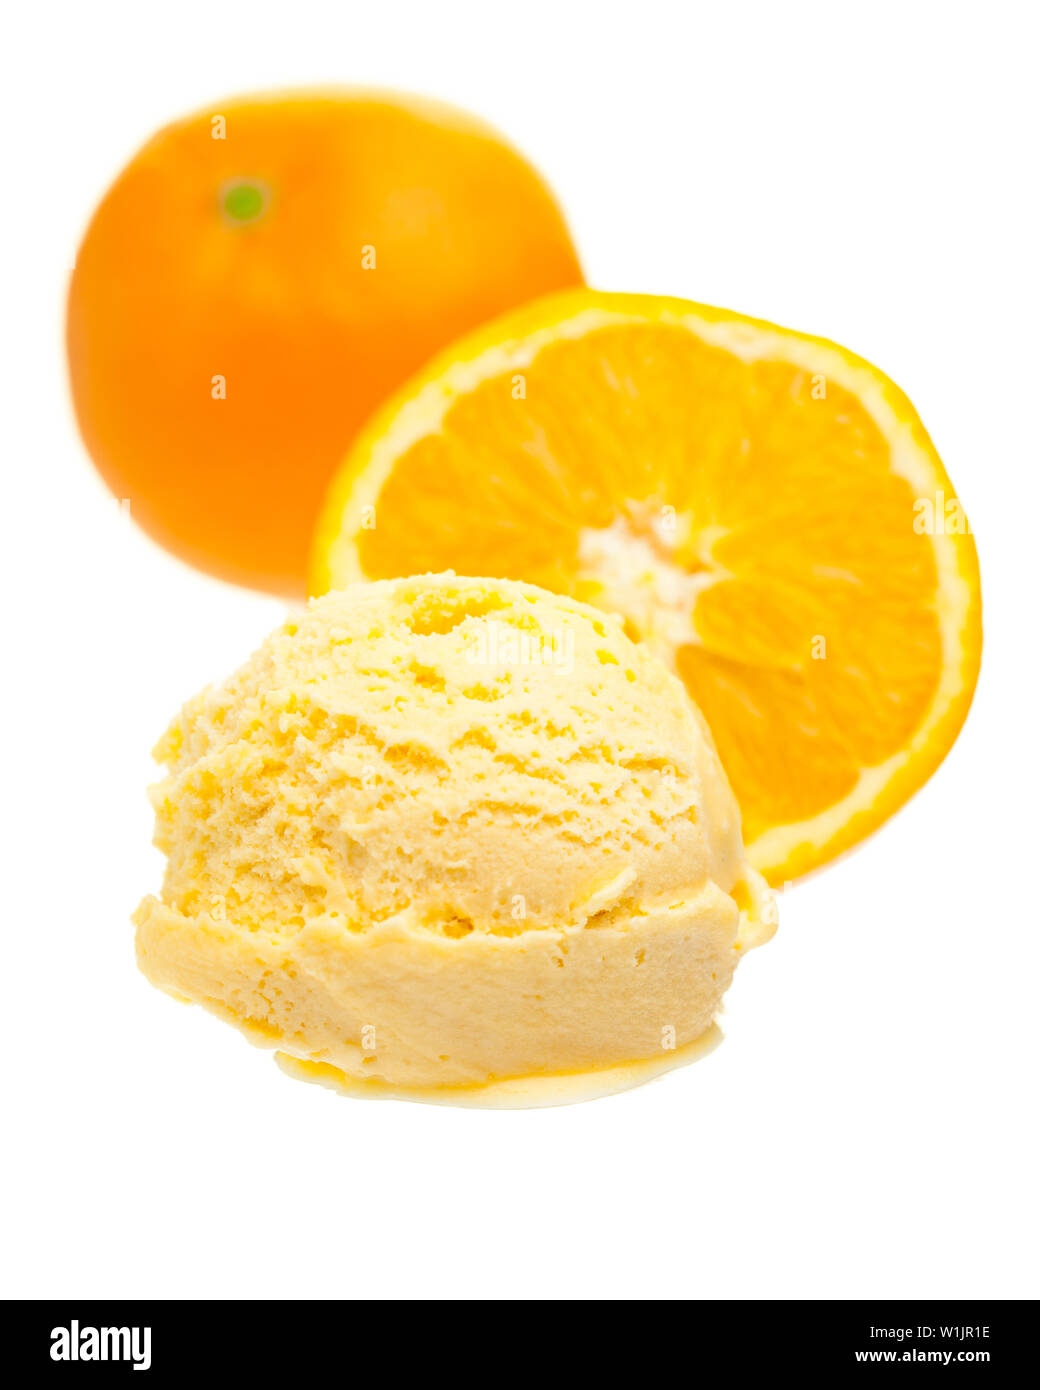 Orange Ice Cream Scoop In Front Of Oranges On White